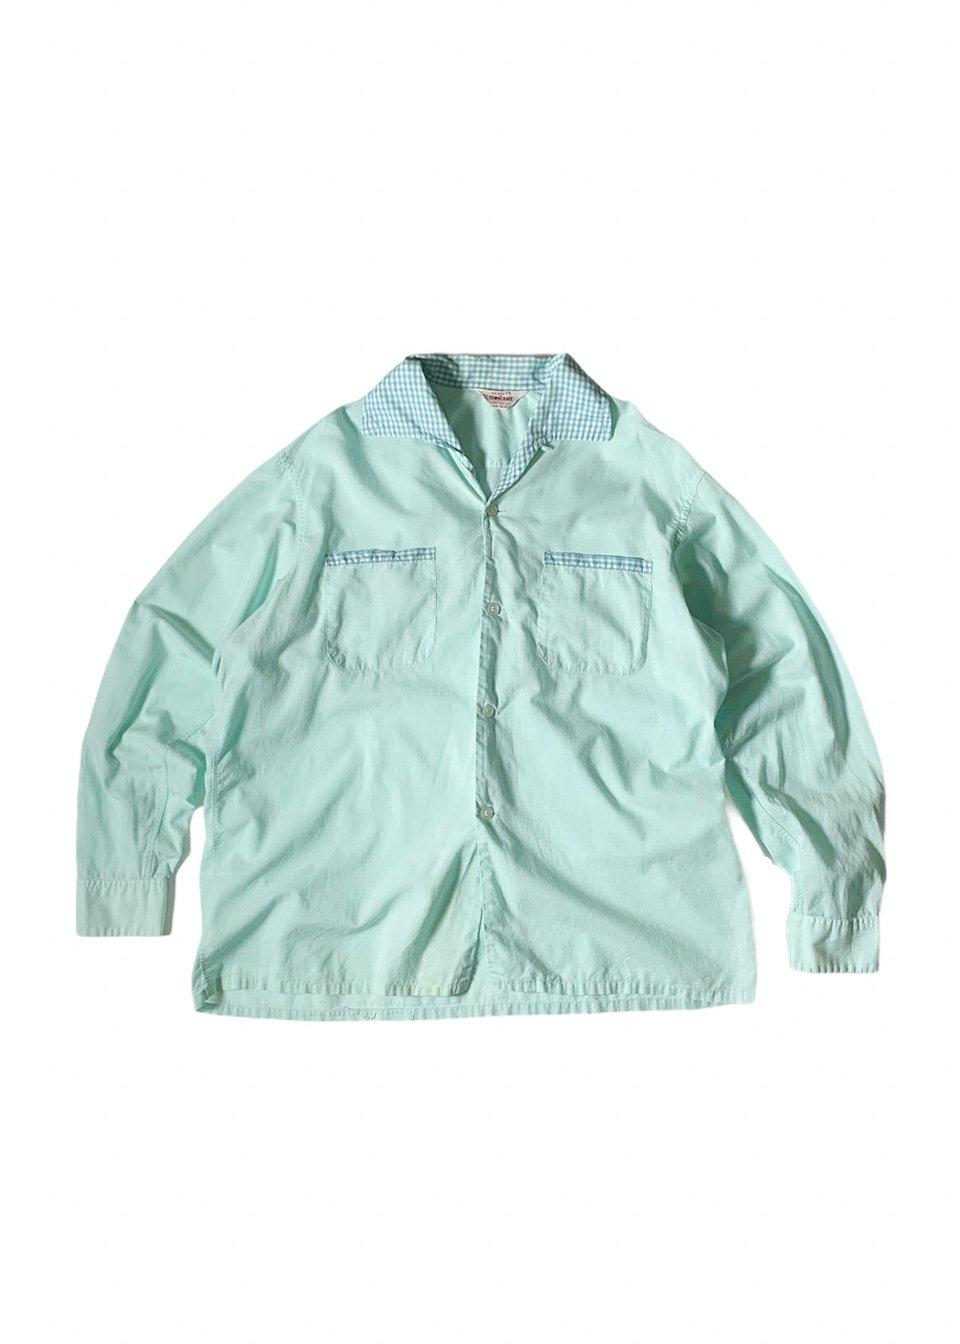 "I&I 古着 通販 ""PENNY'S TOWNCRAFT"" Pajama L/S Shirt 詳細画像"